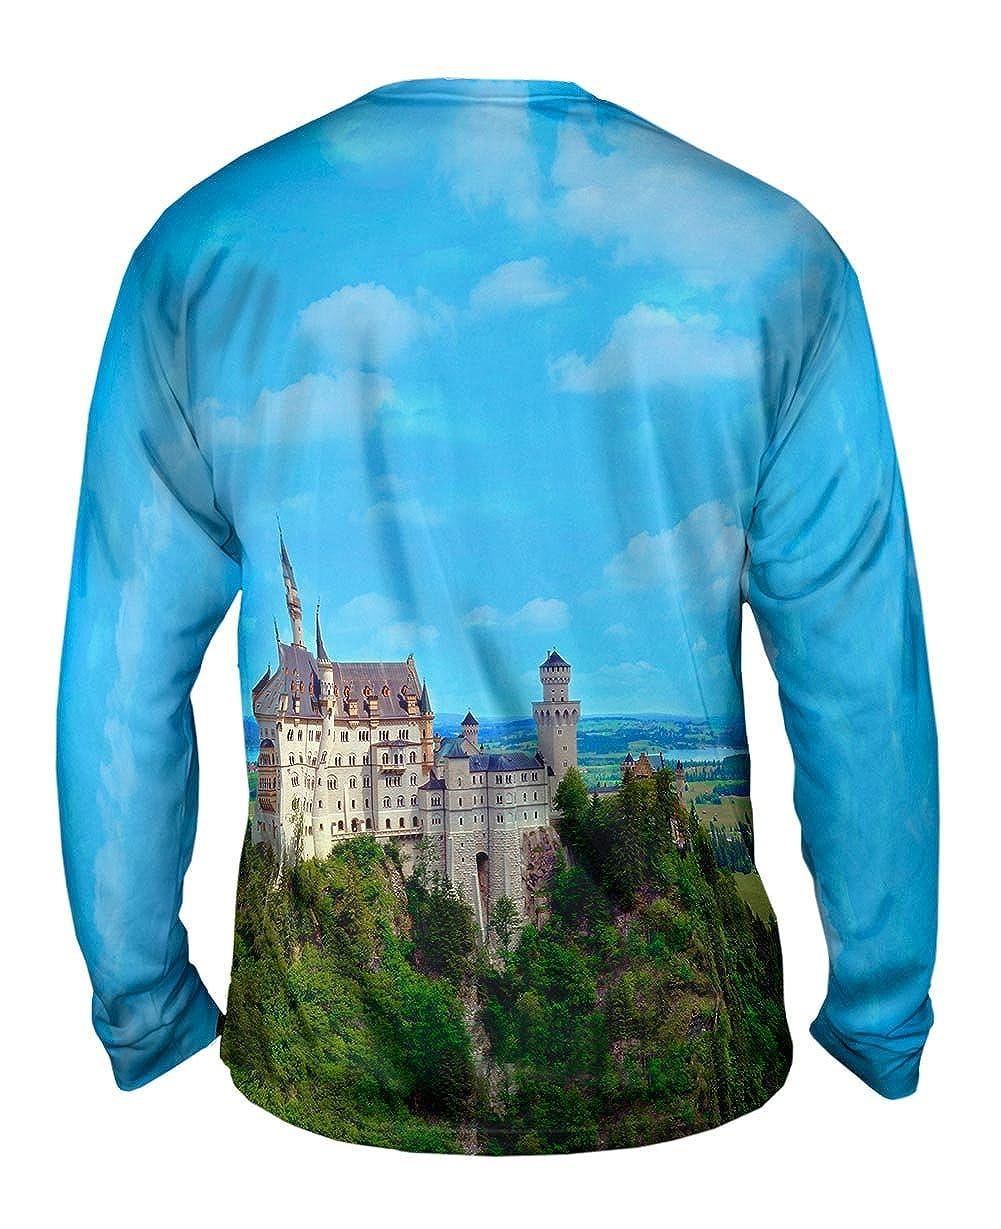 Germany Castle Neuschwanstein TShirt Yizzam Mens Long Sleeve